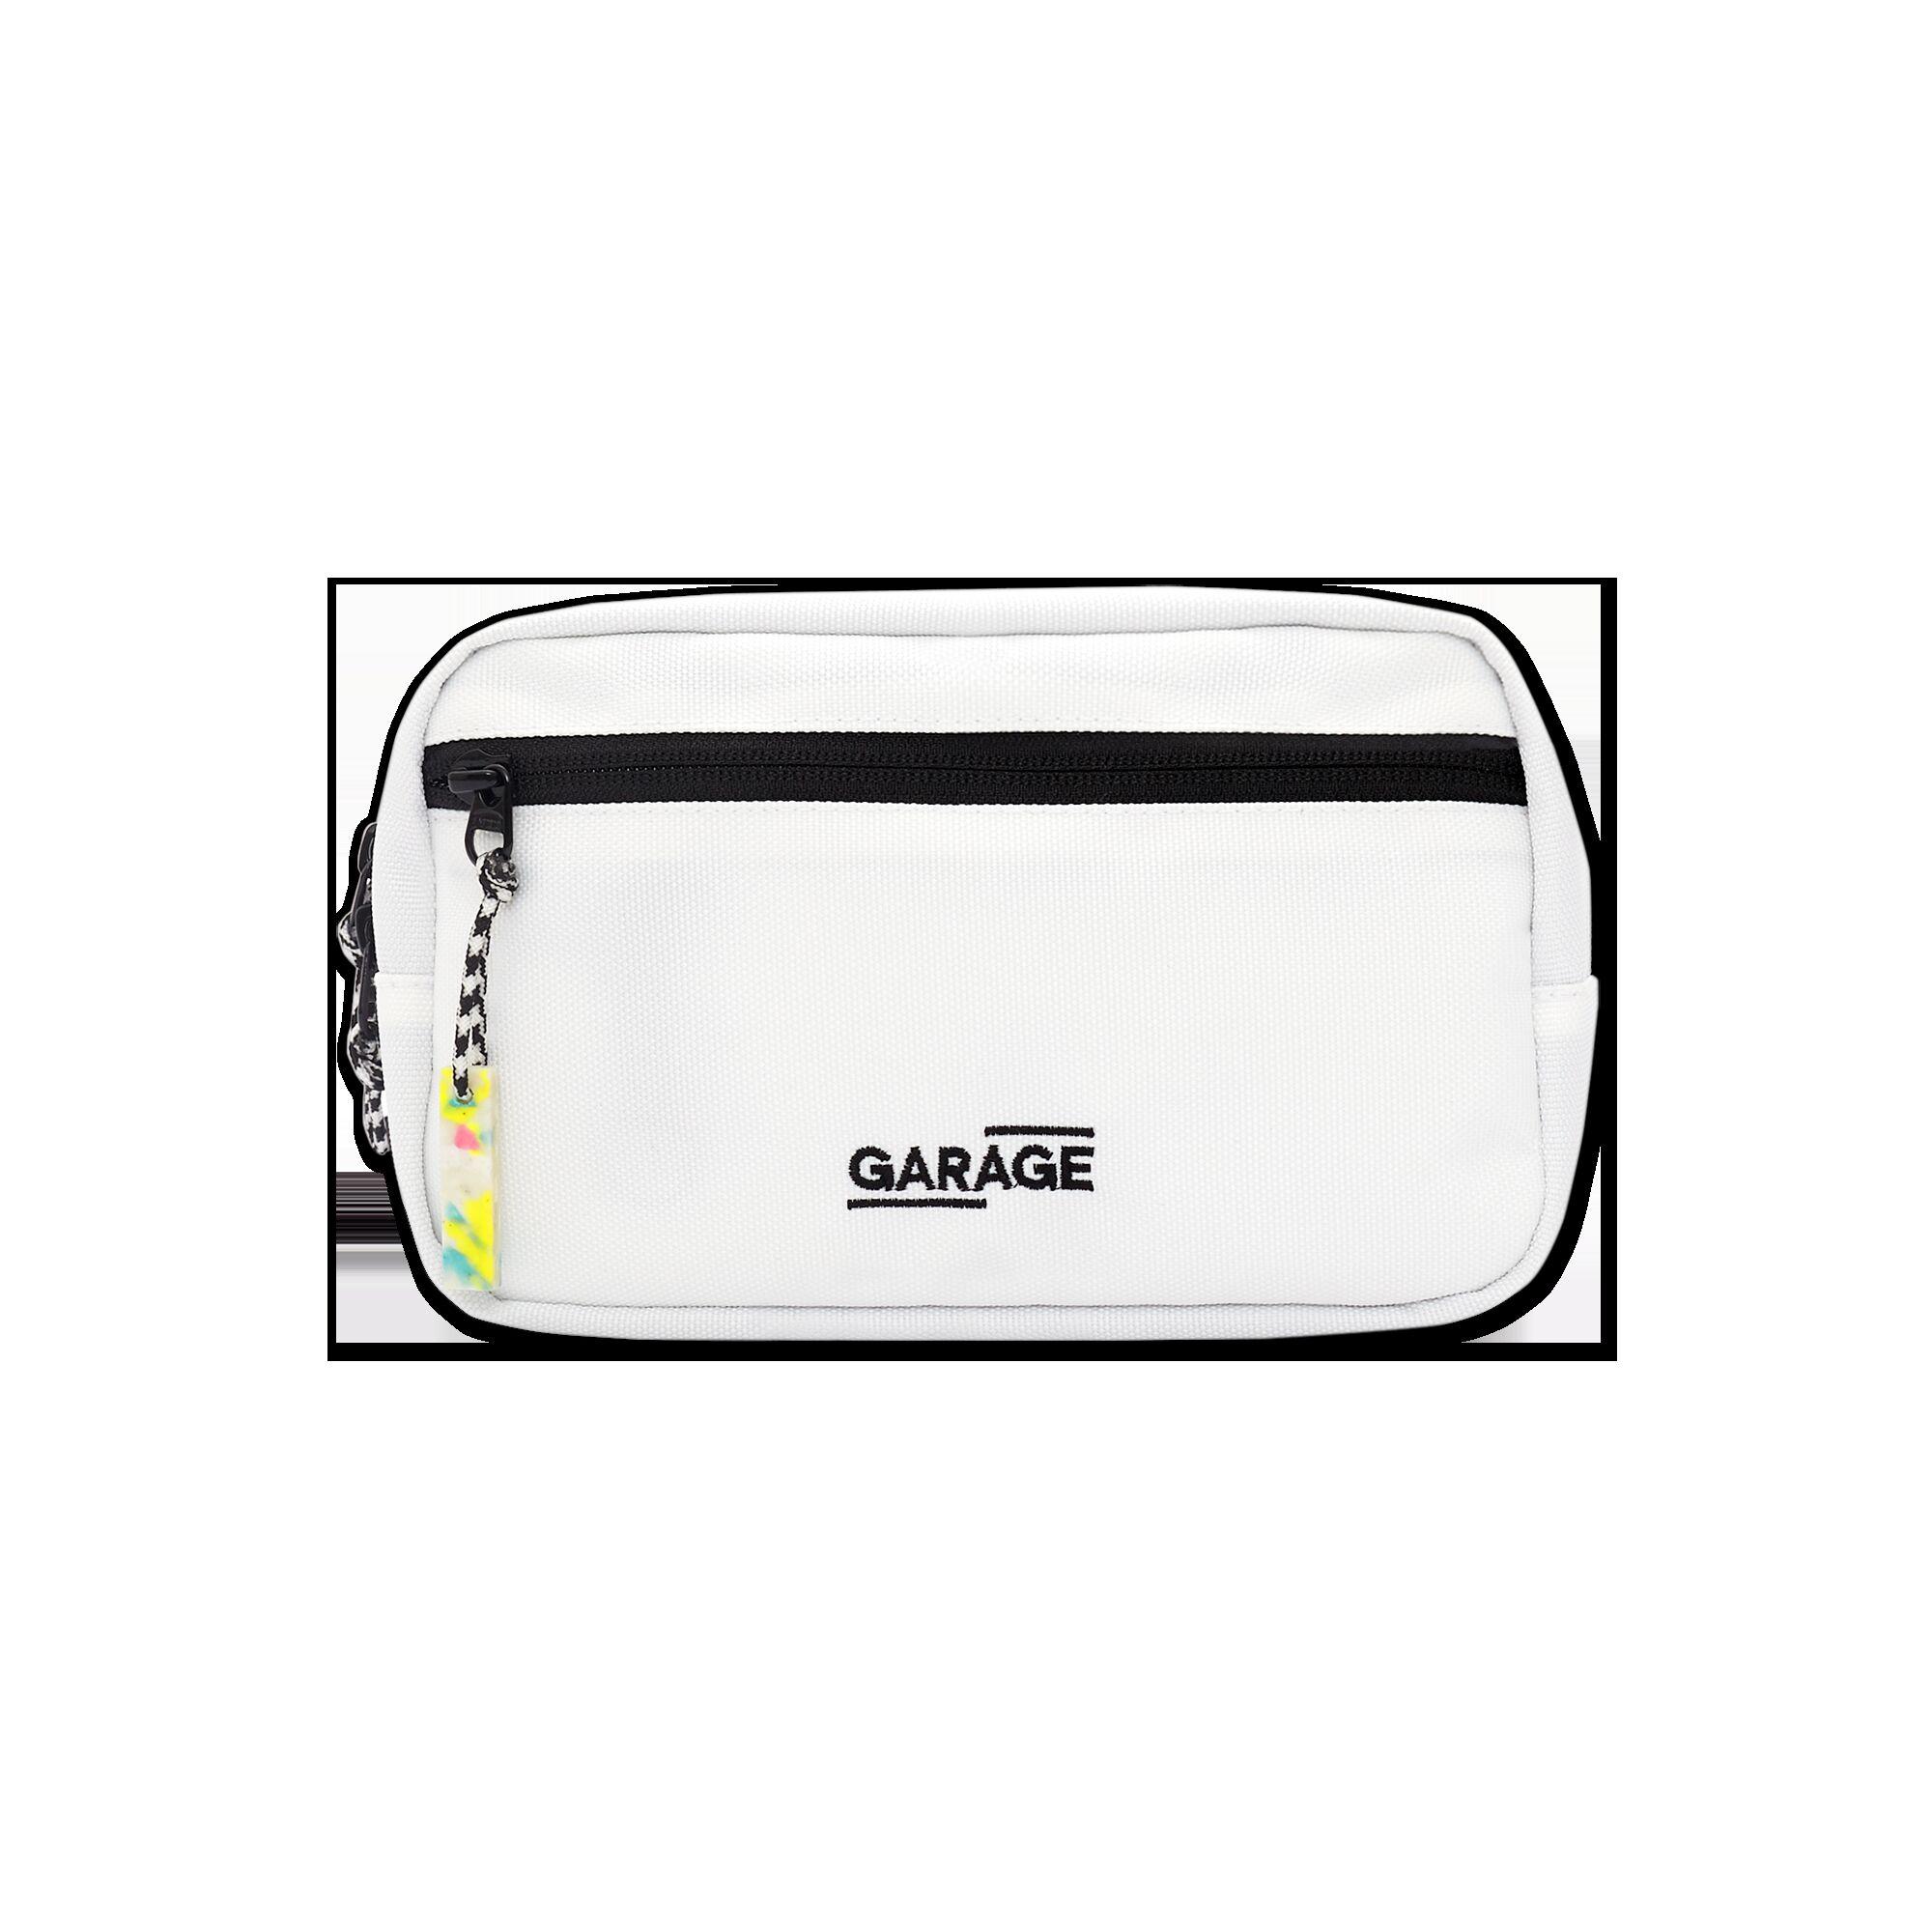 GARAGE Crossbody Bag